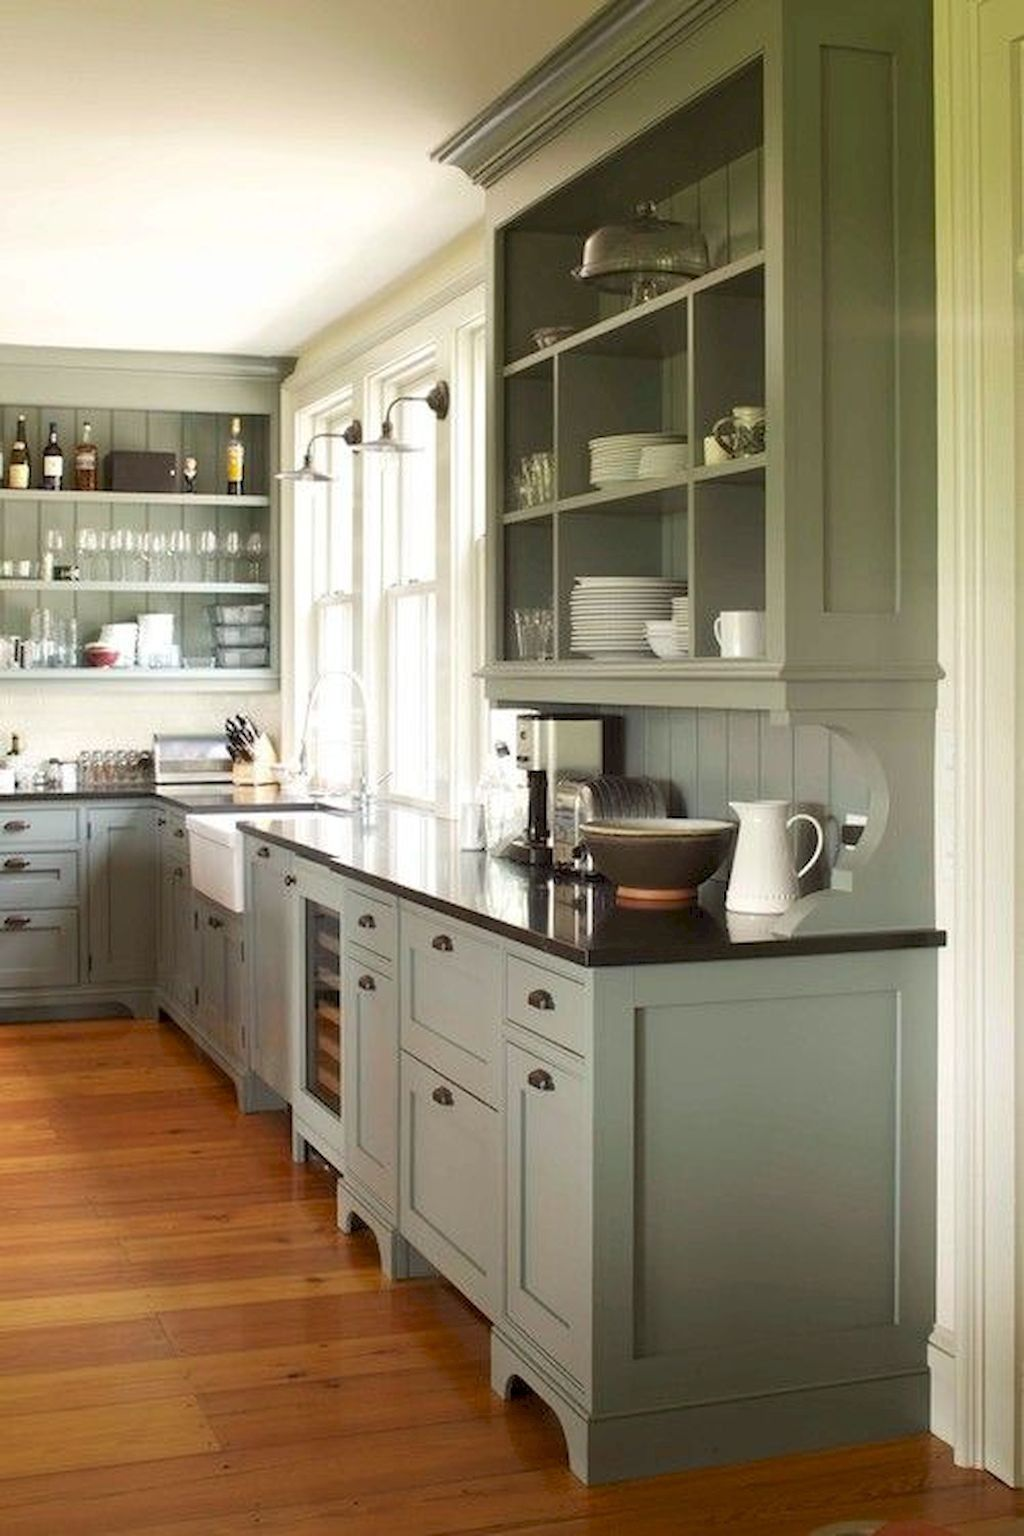 54 luxury farmhouse kitchen cabinet makeover design ideas kitchen cabinet design farmhouse on farmhouse kitchen cabinets id=26310